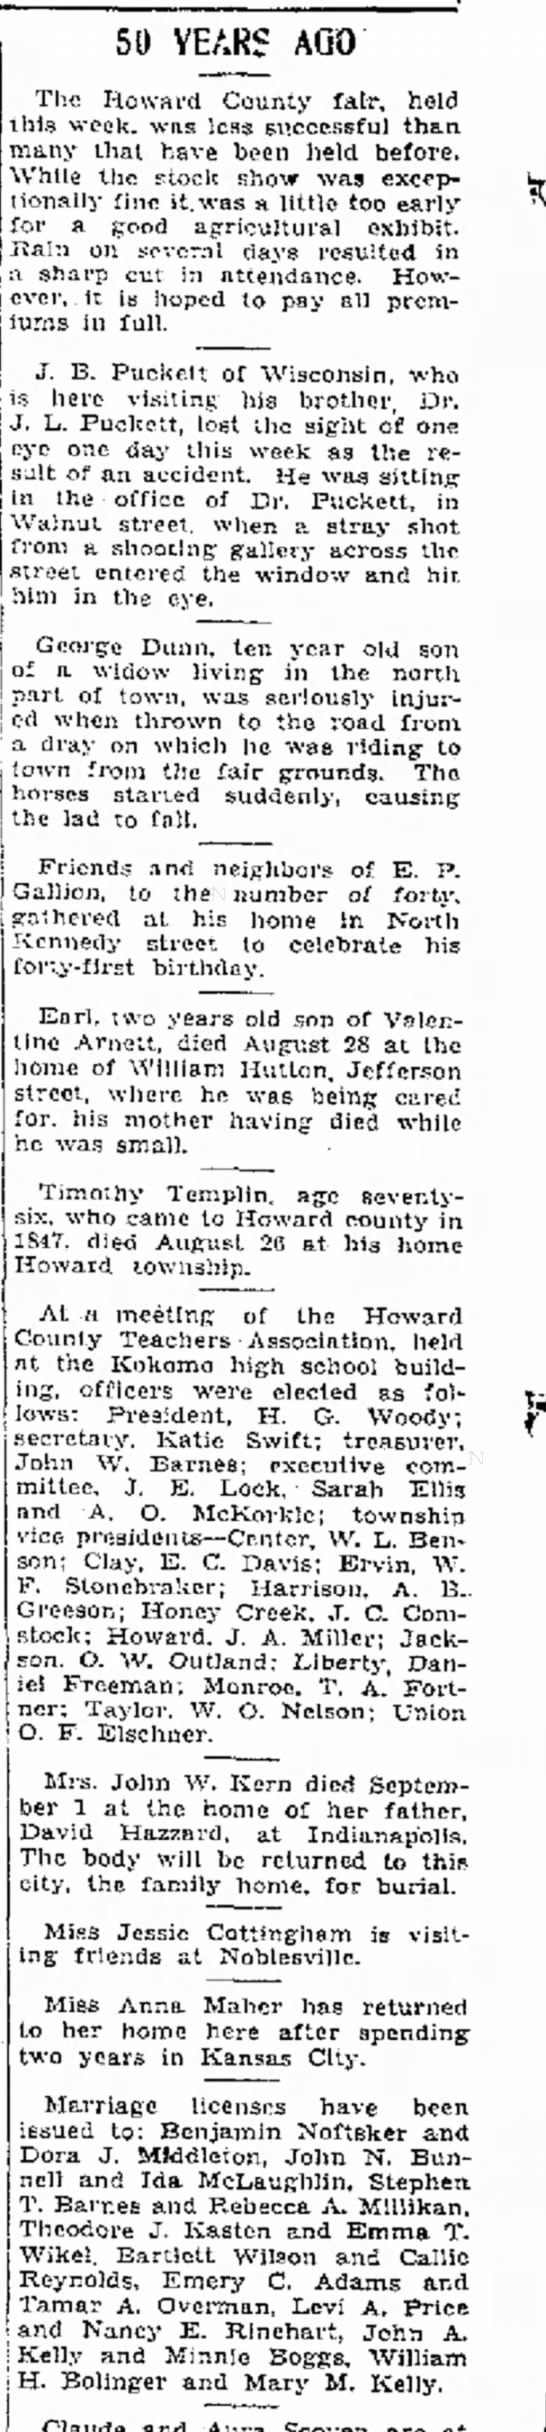 50 years ago in 1934-EmeryC. Adams I, marriage to Tamar Overman 1884. -